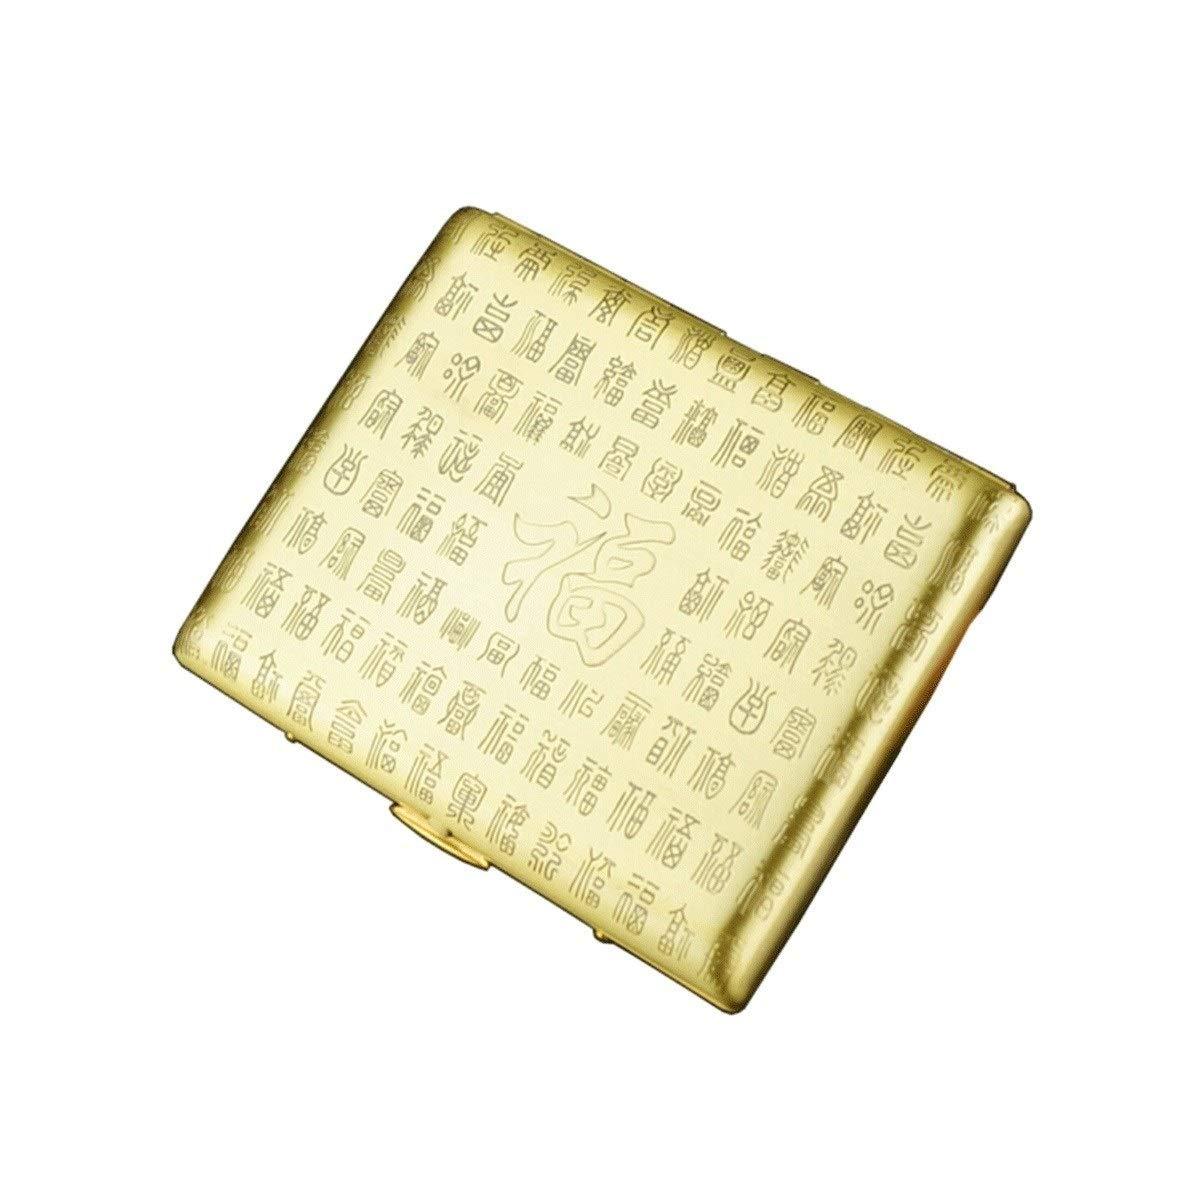 WalledKing Copper Cigarette Case, Vintage Portable Engraving Cigarette Case, 18 Sticks, Smoker Box (Color : Gold)